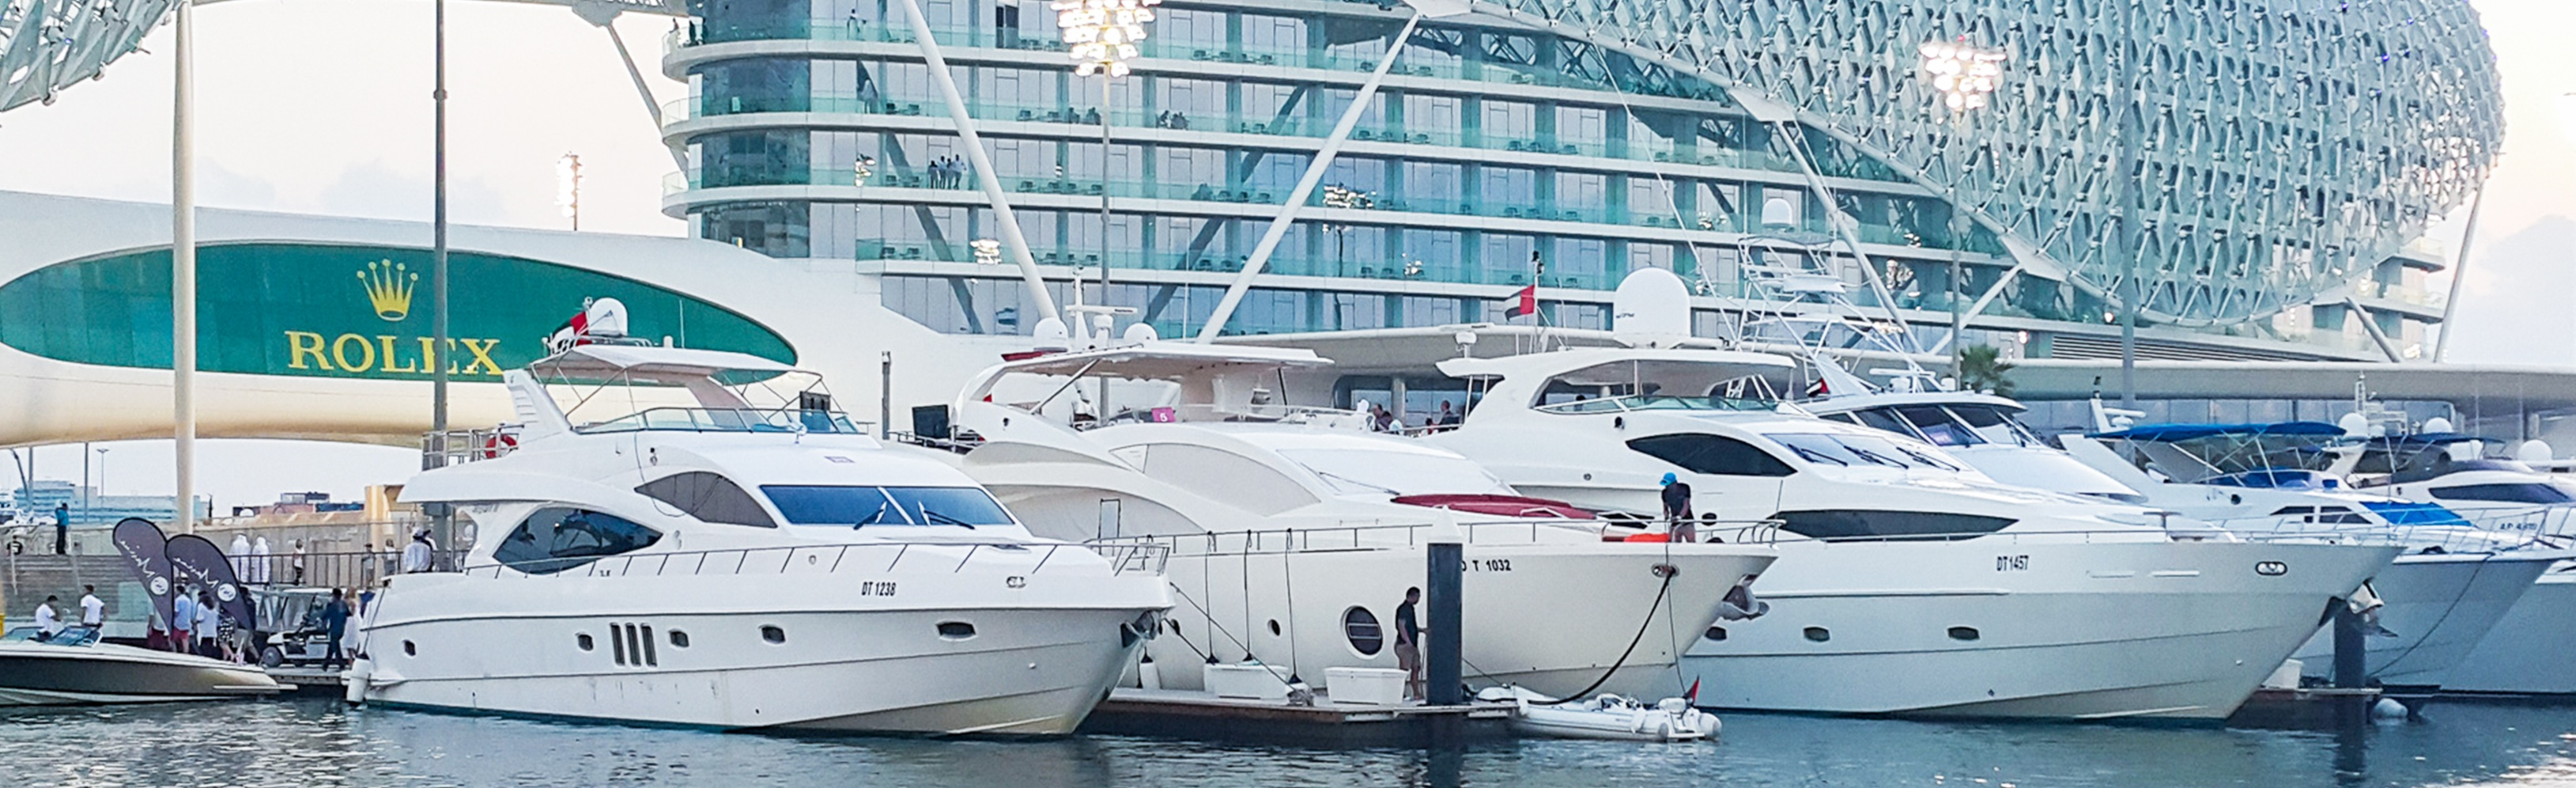 Majesty-88s-at-the-Yas-Marina,-Abu-Dhabi.jpg